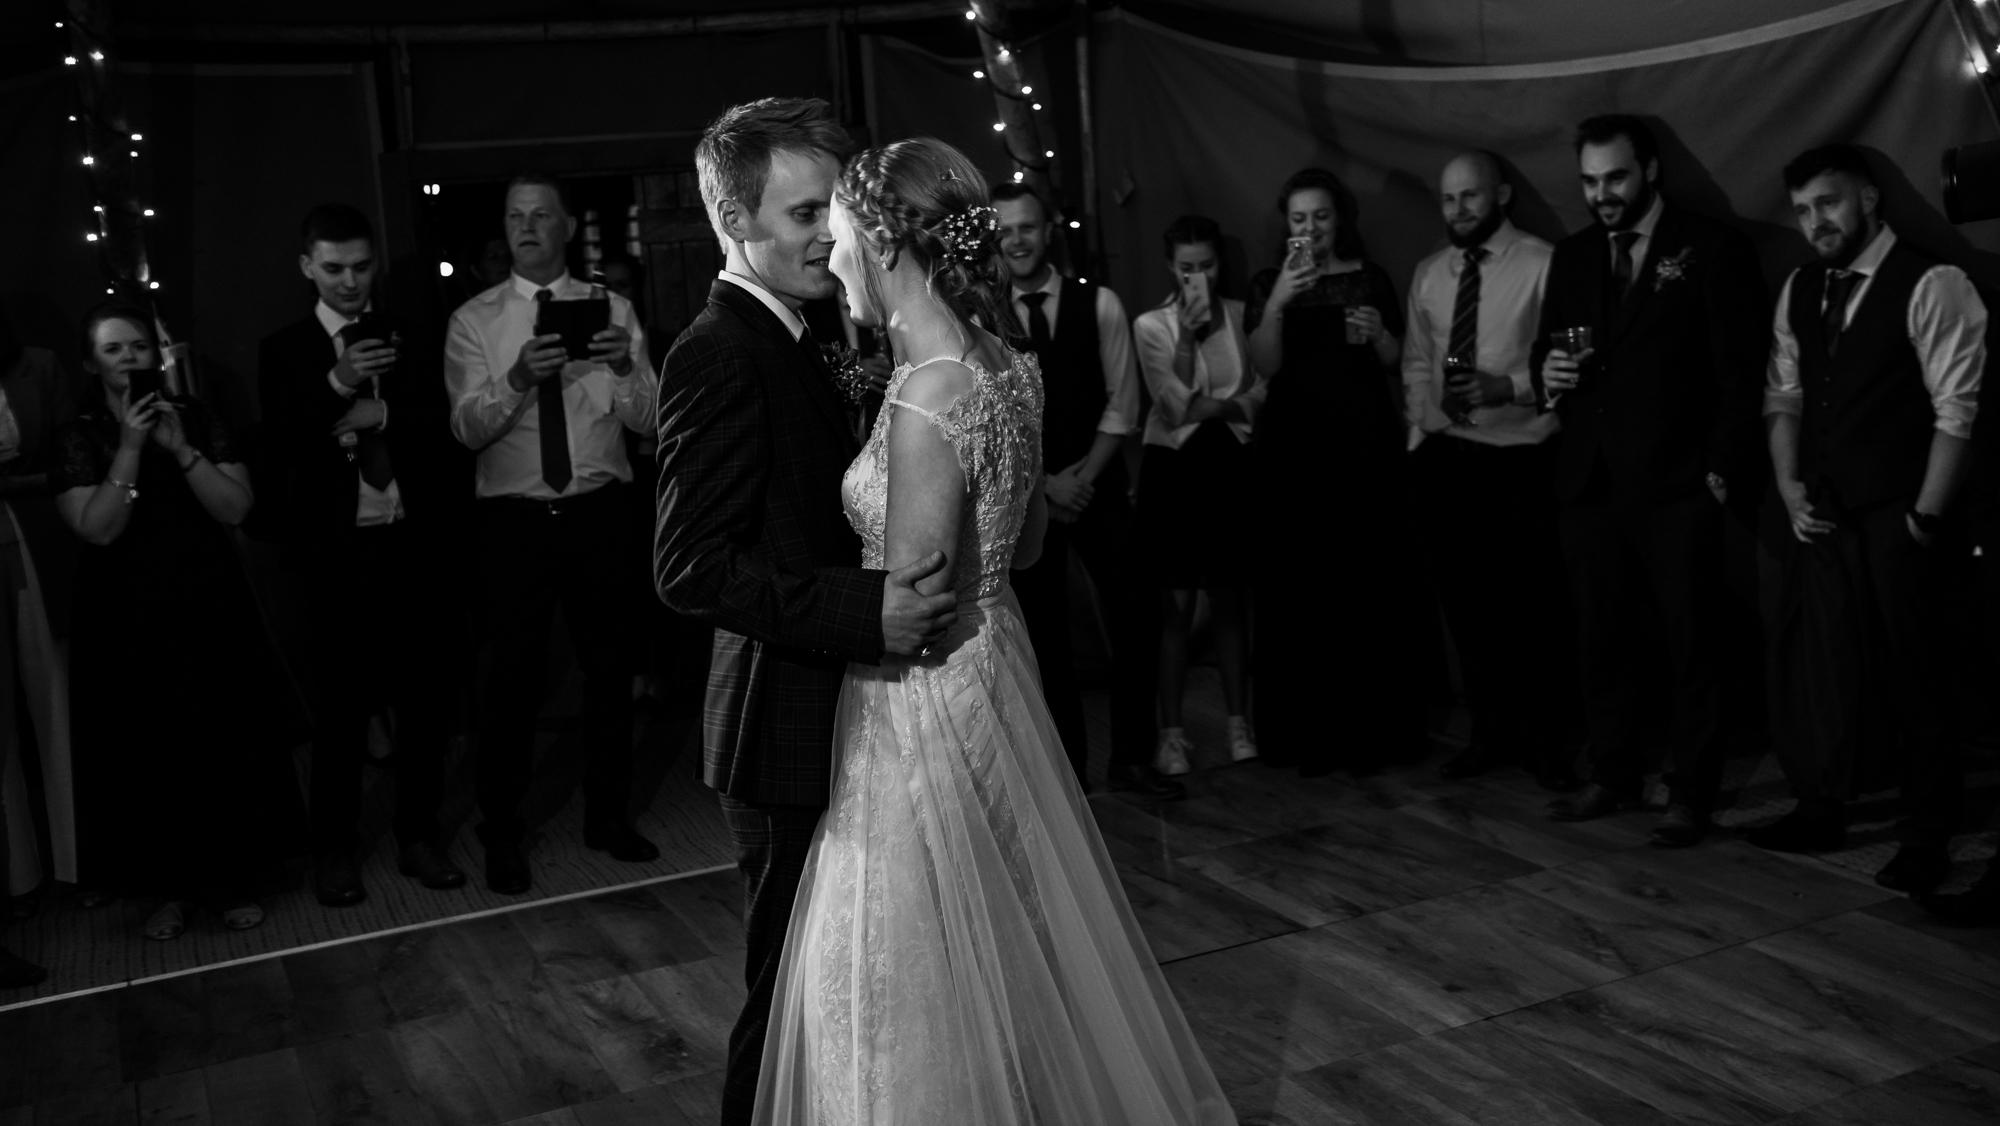 Katie and Dode weddings (192 of 207).jpg